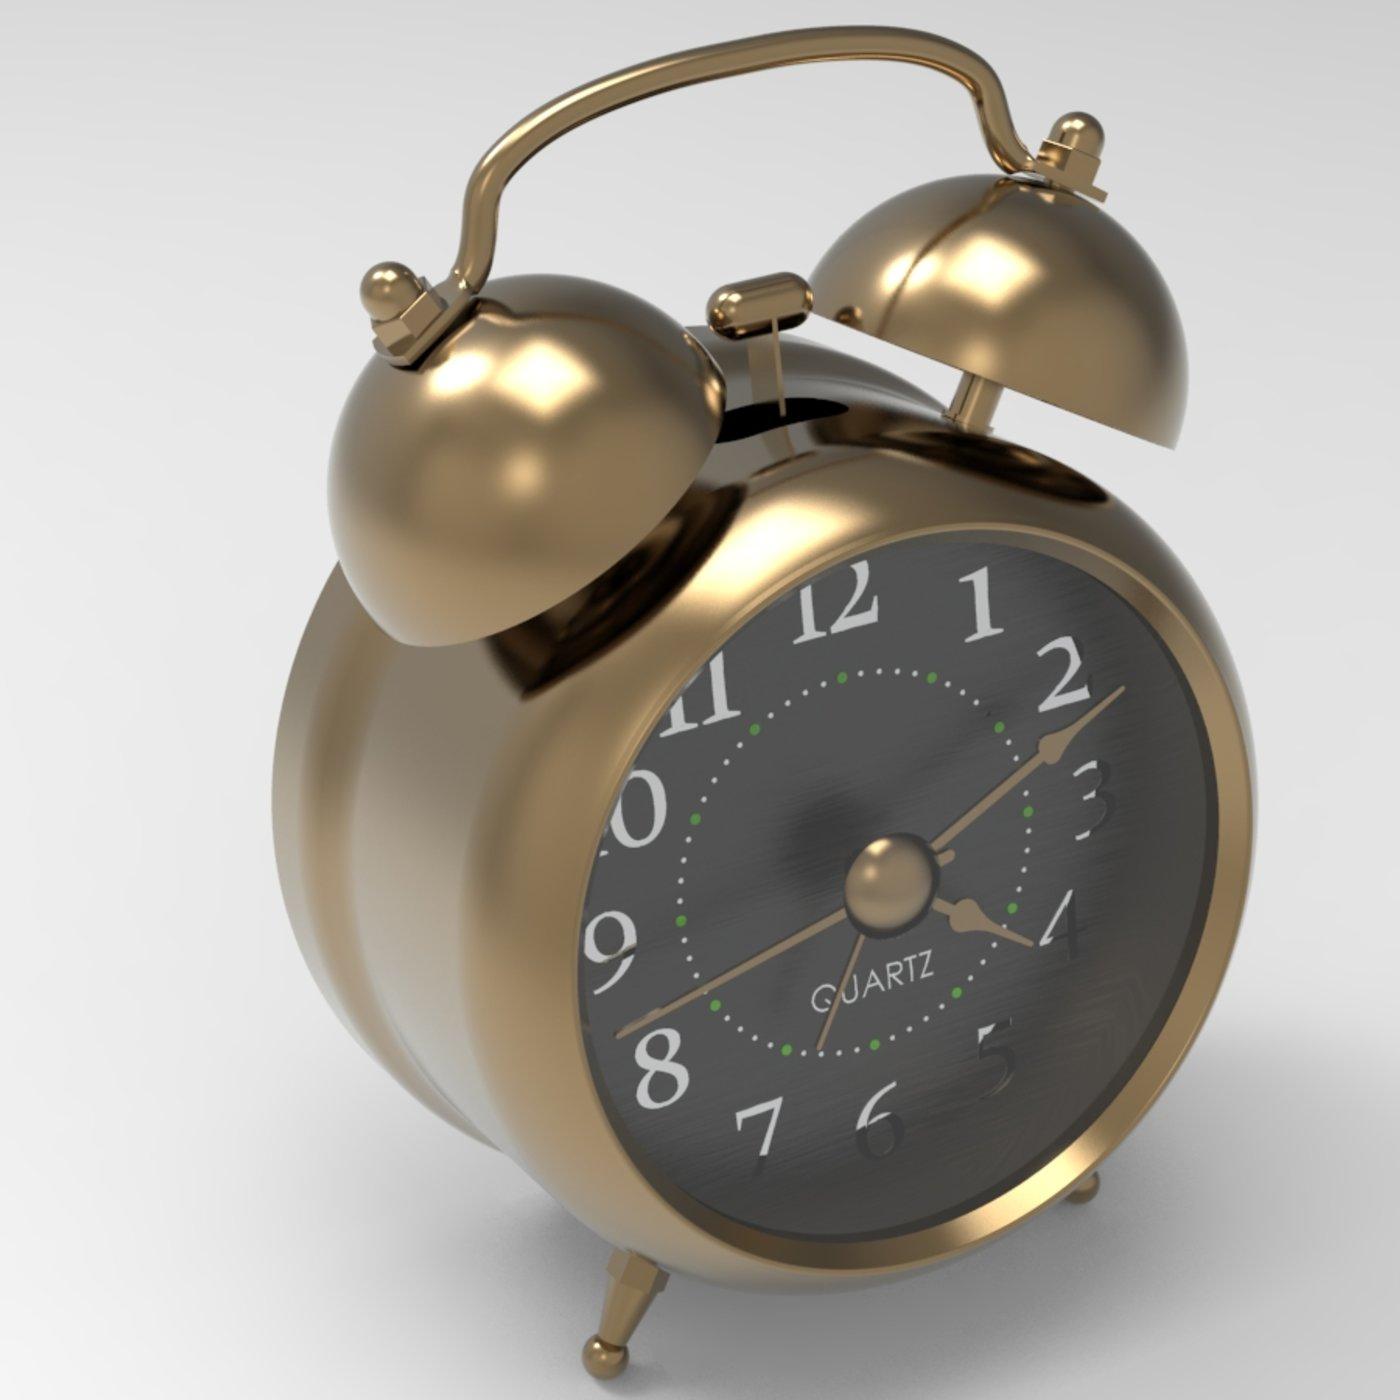 Twin Bell Alarm Clock - Old Fashion